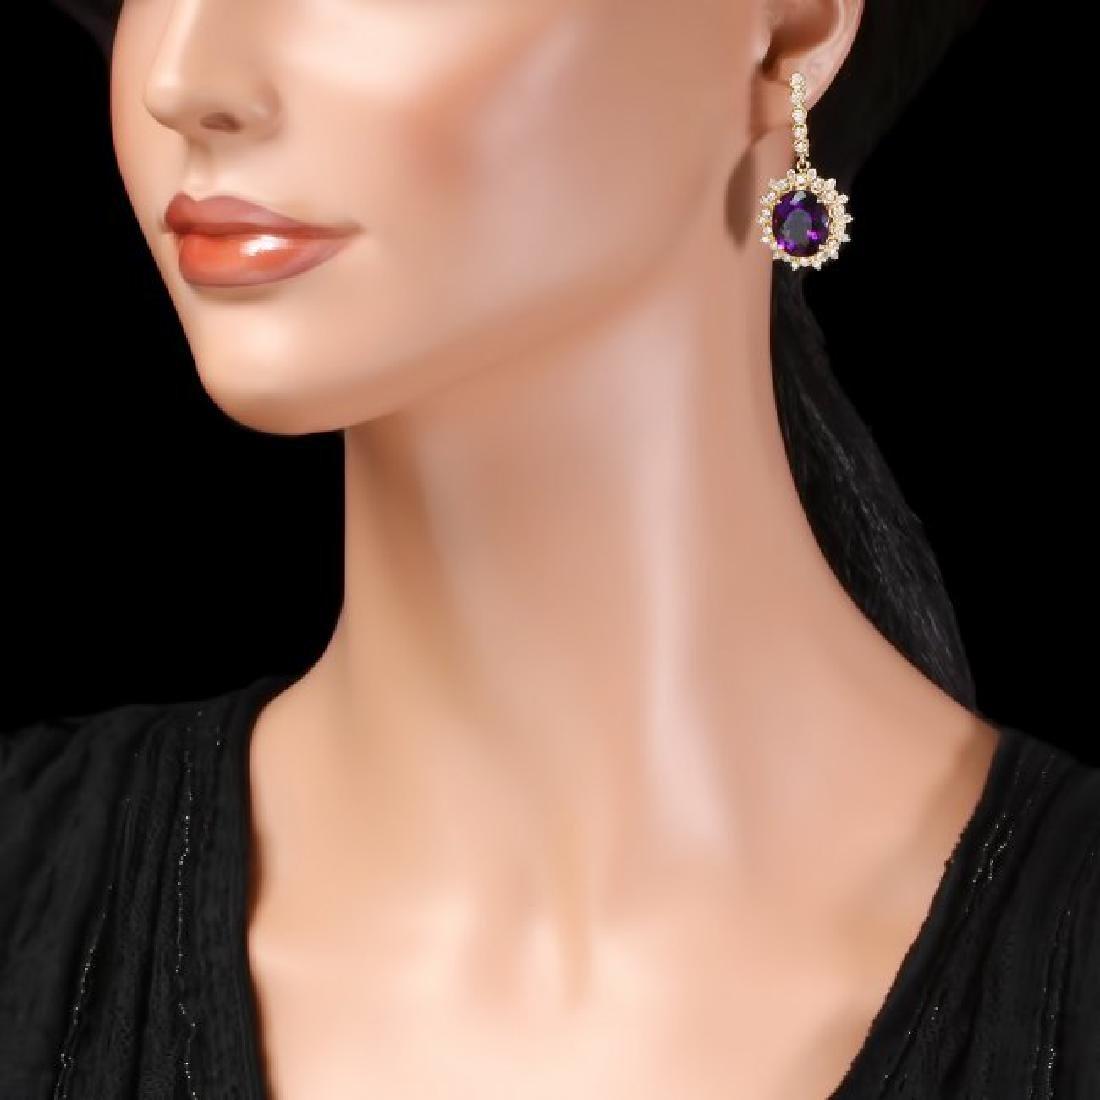 14k Gold 16ct Amethyst 1.8ct Diamond Earrings - 3